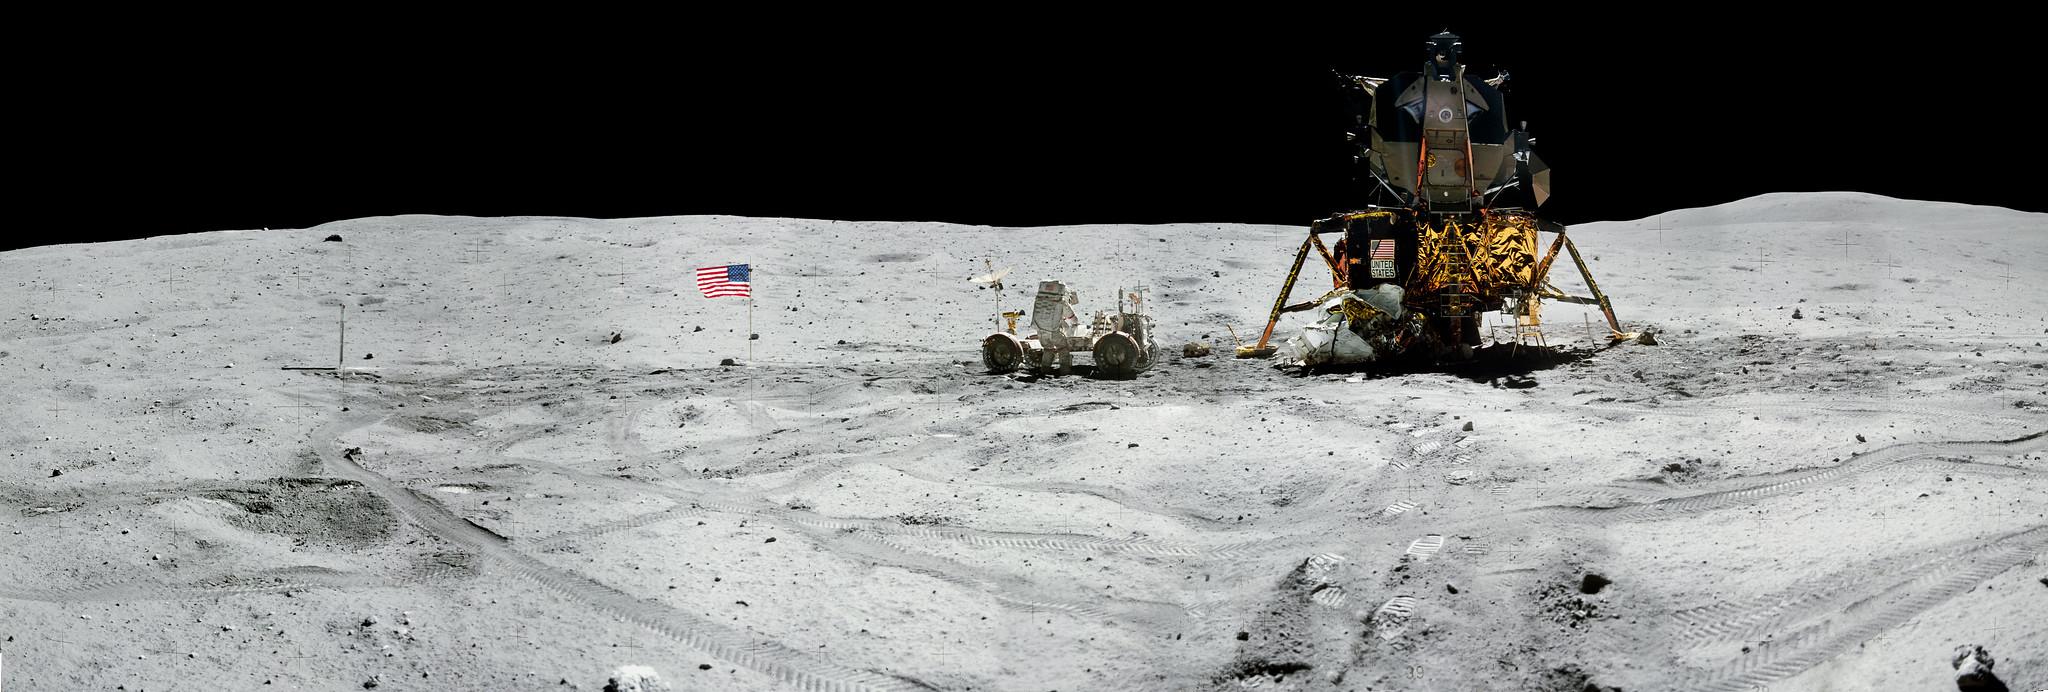 Mondlandung 1969